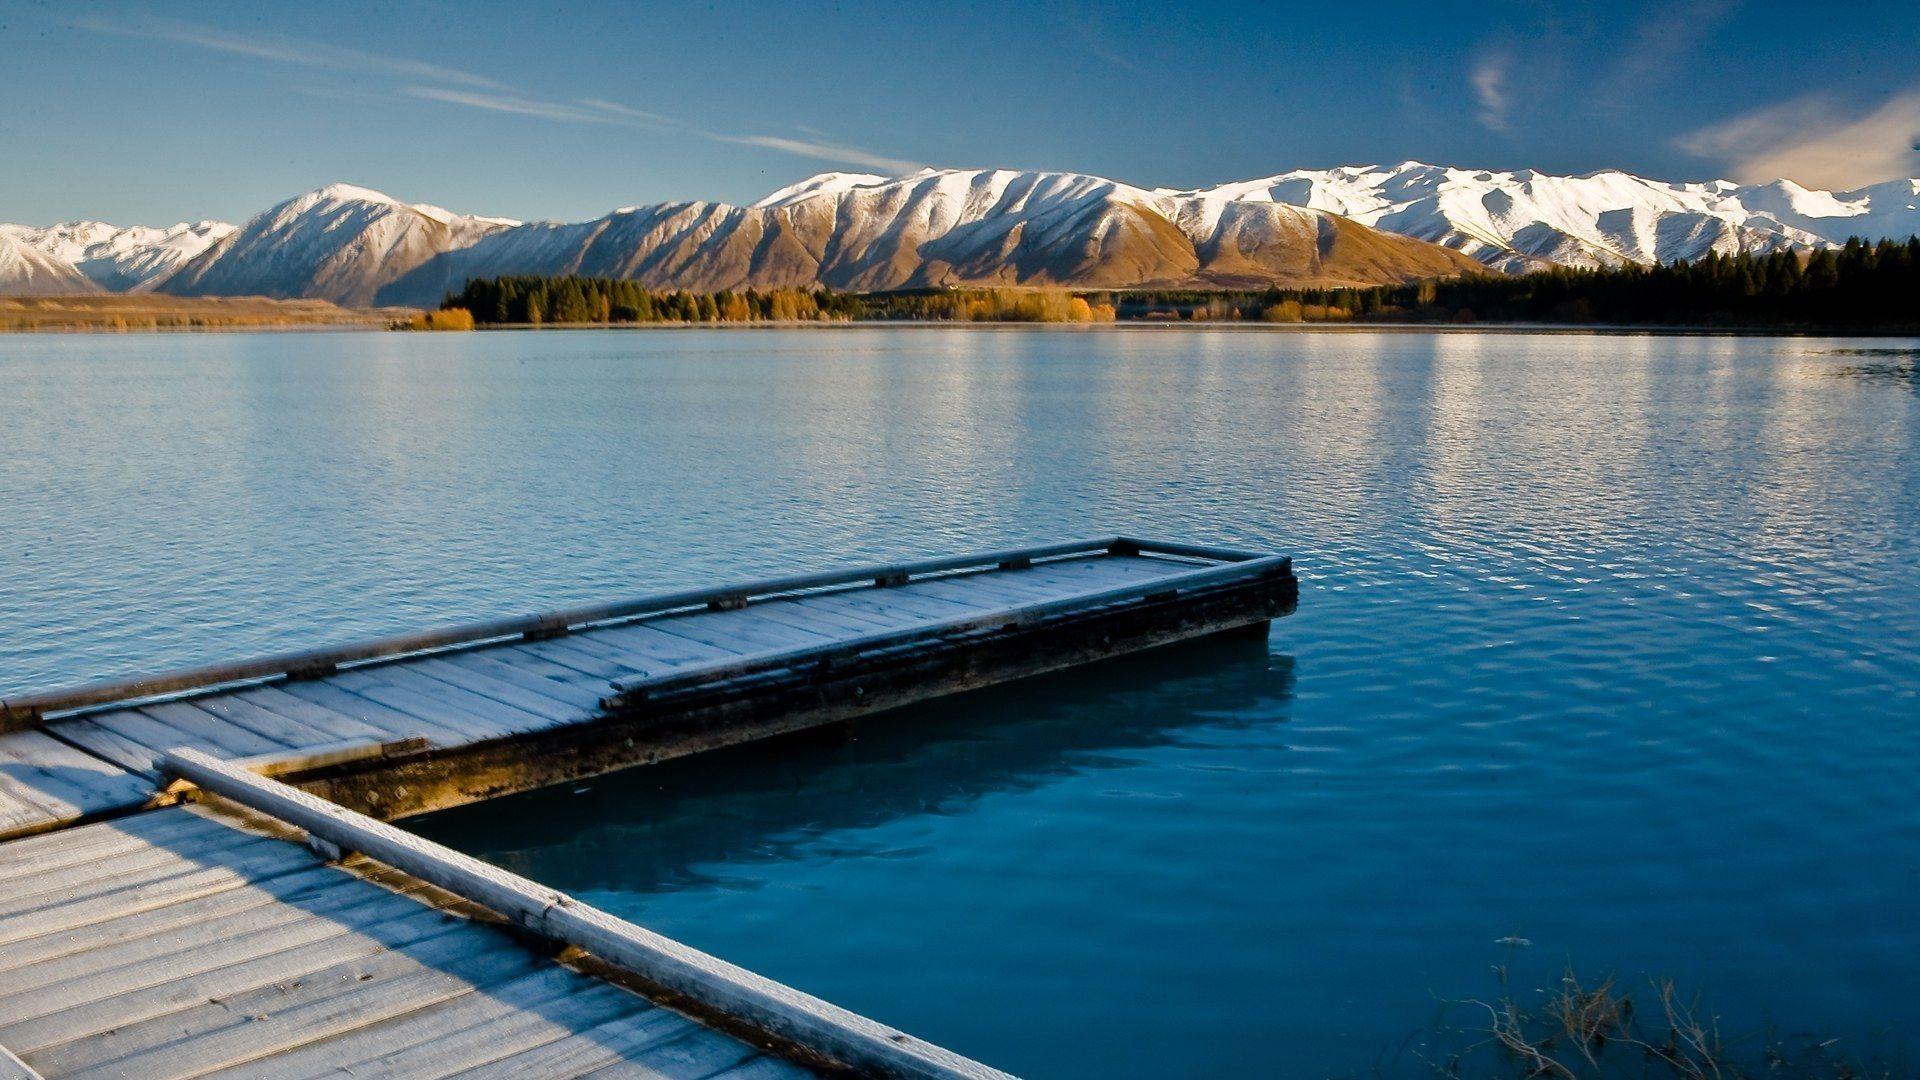 New Zealand full hd wallpaper download